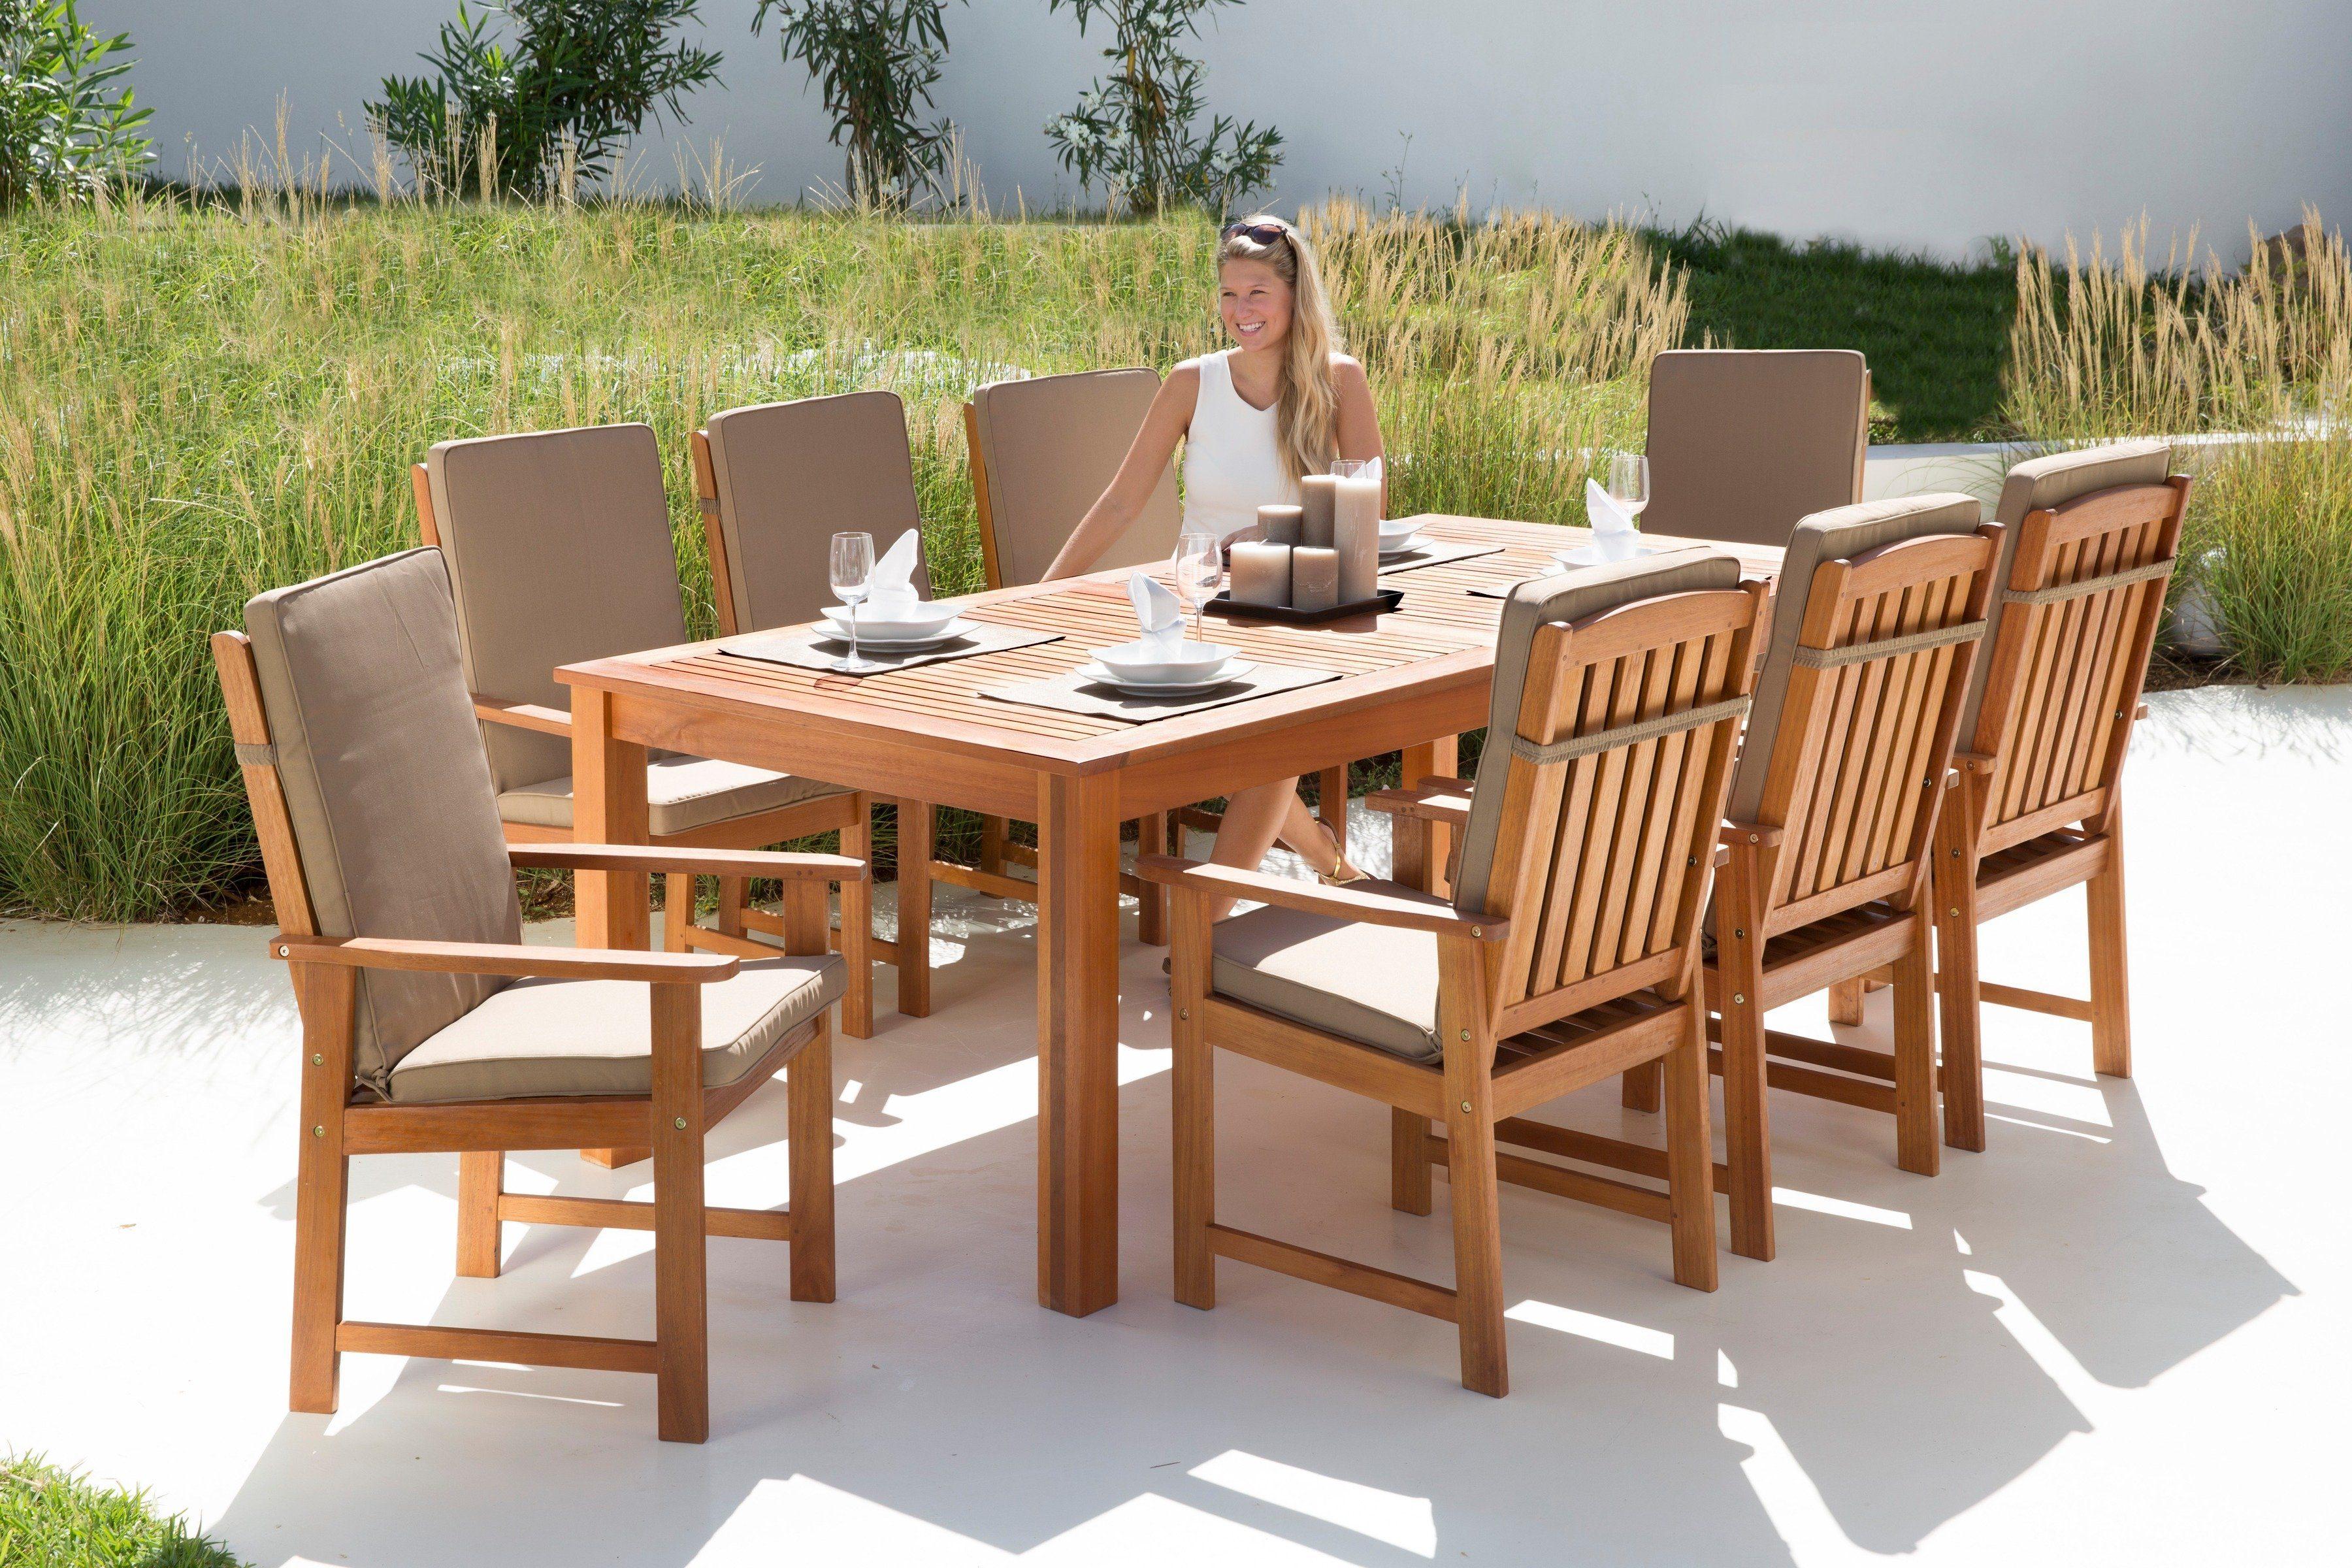 Gartenmöbelset »Vancouver«, 17-tgl., 8 Sessel, Tisch 220x110 cm, Eukalyptusholz, braun